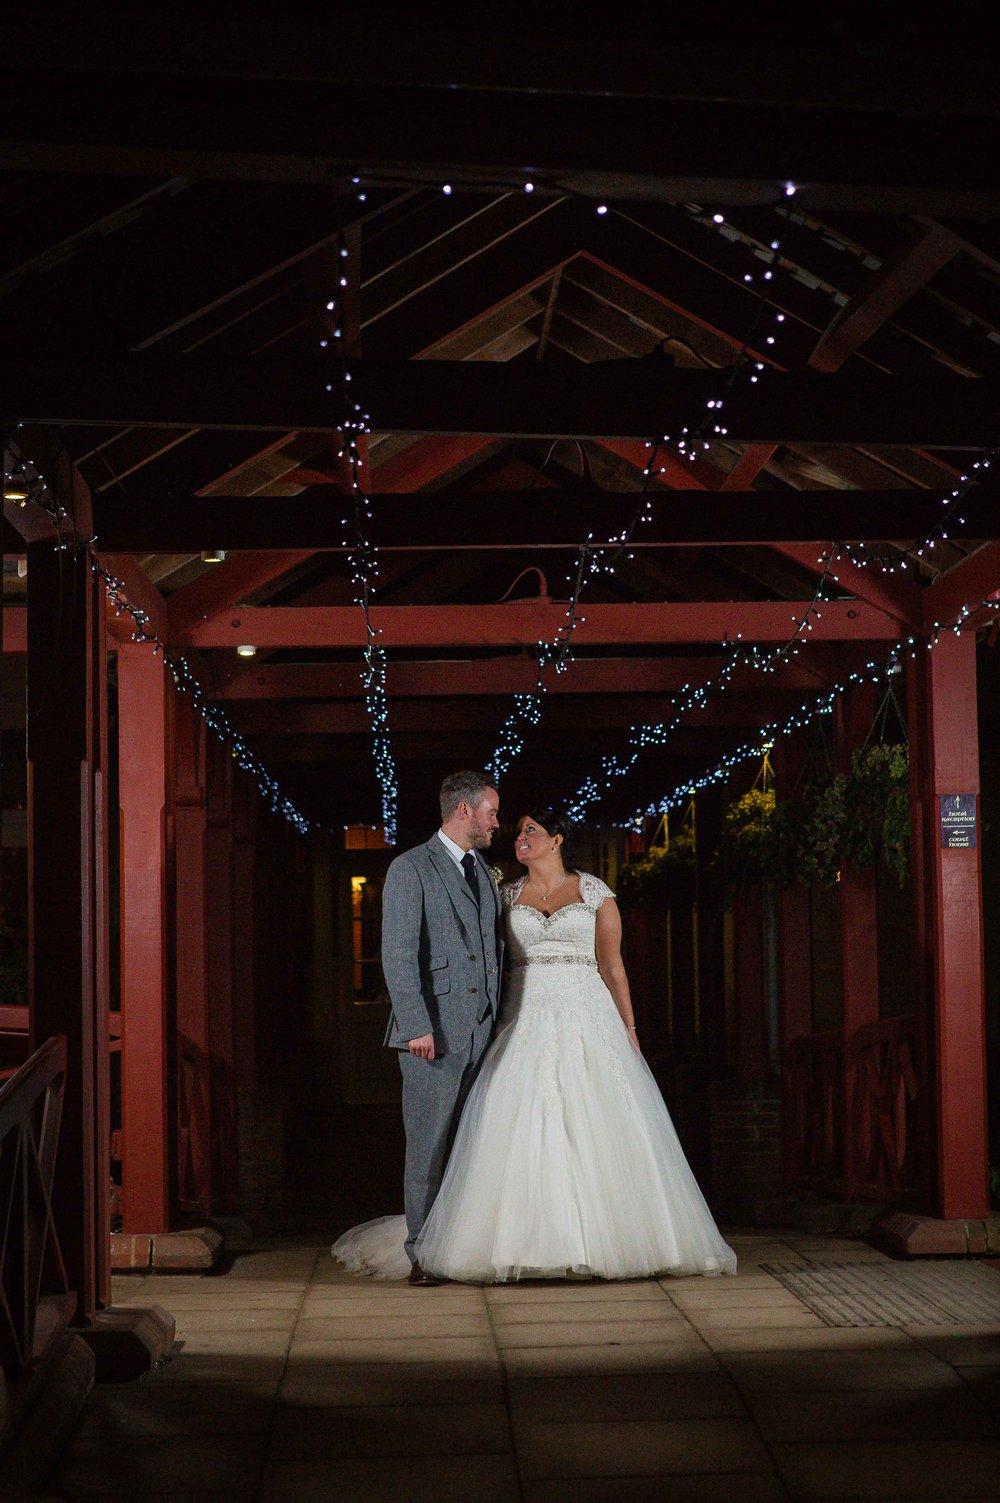 14.02.17 - Matt-Faye-Coombe-Abbey-Valentine-Wedding-Charnwood-Photography-1097.jpg